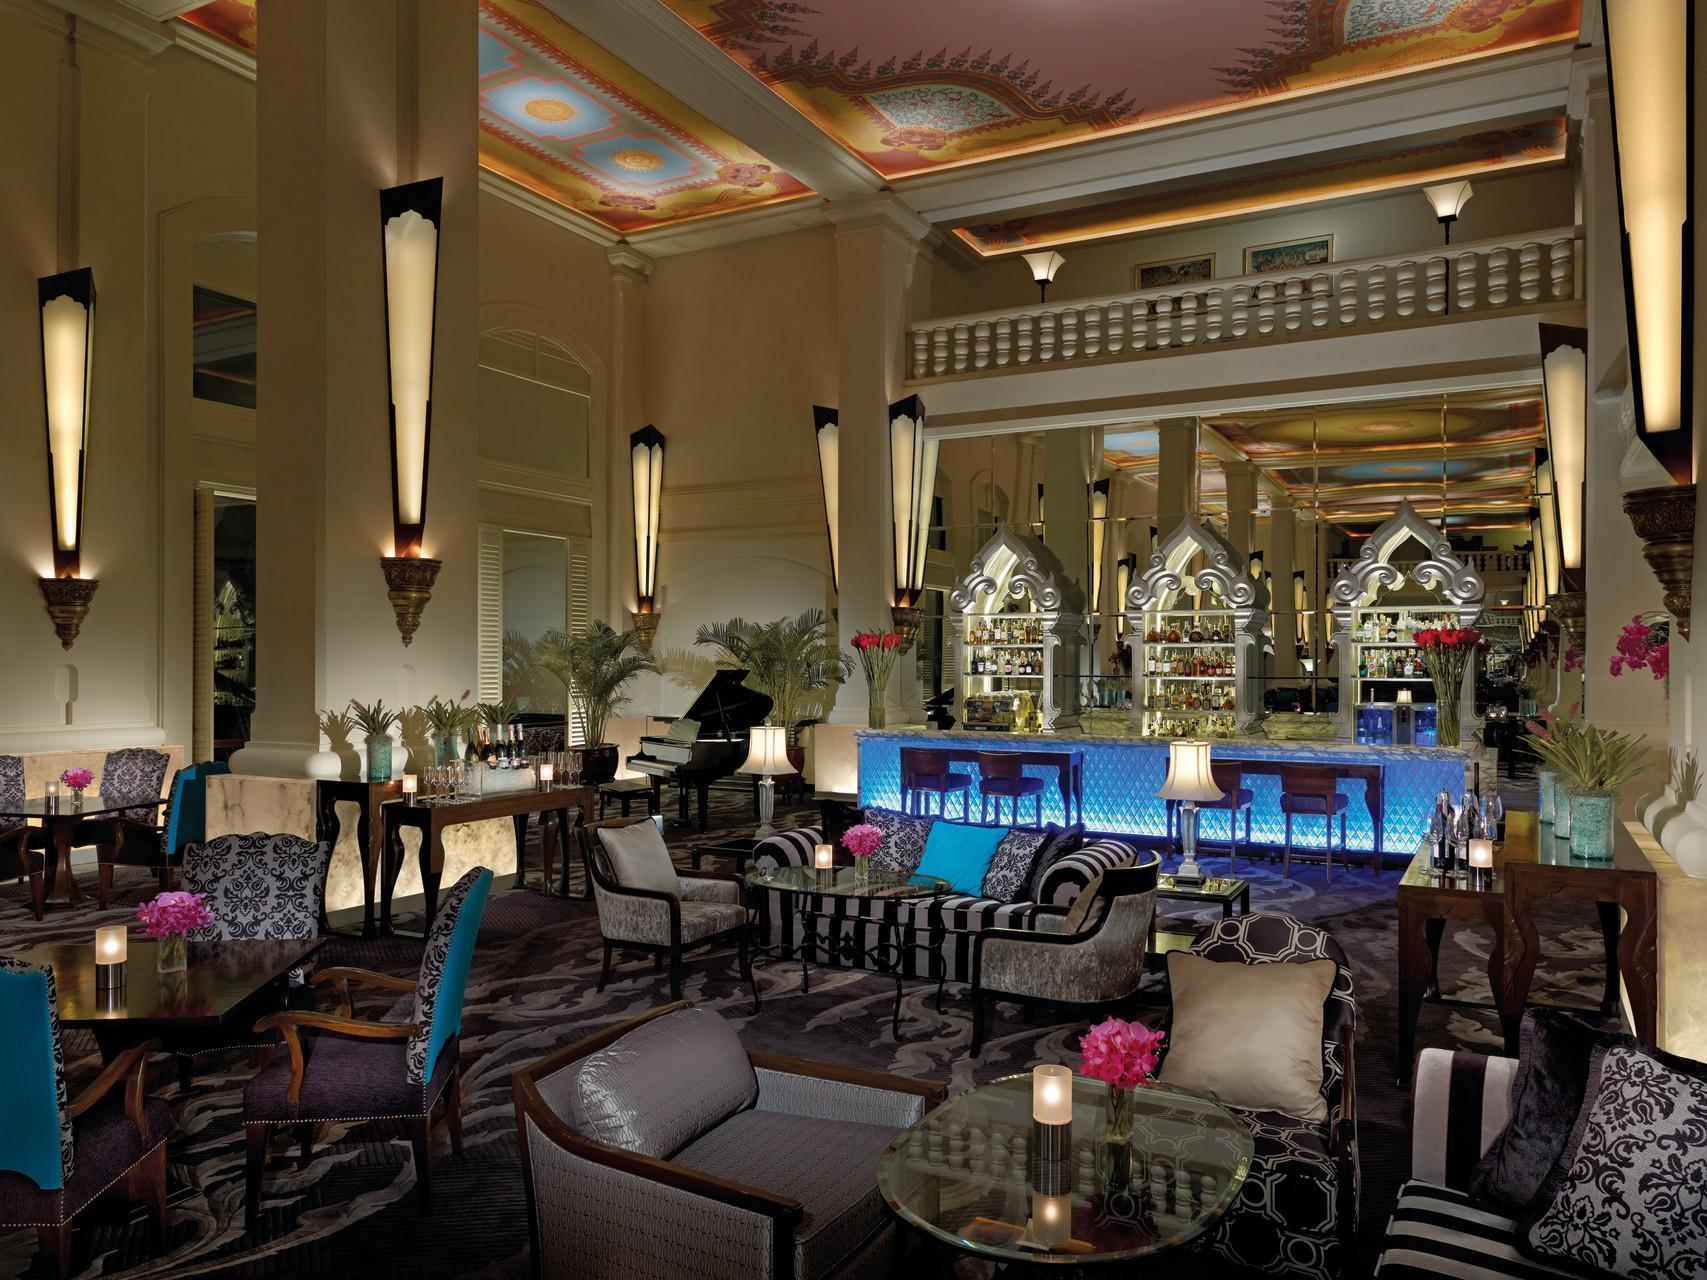 Anantara Siam Bangkok Hotel โรงแรมอนันตรา สยาม กรุงเทพฯ